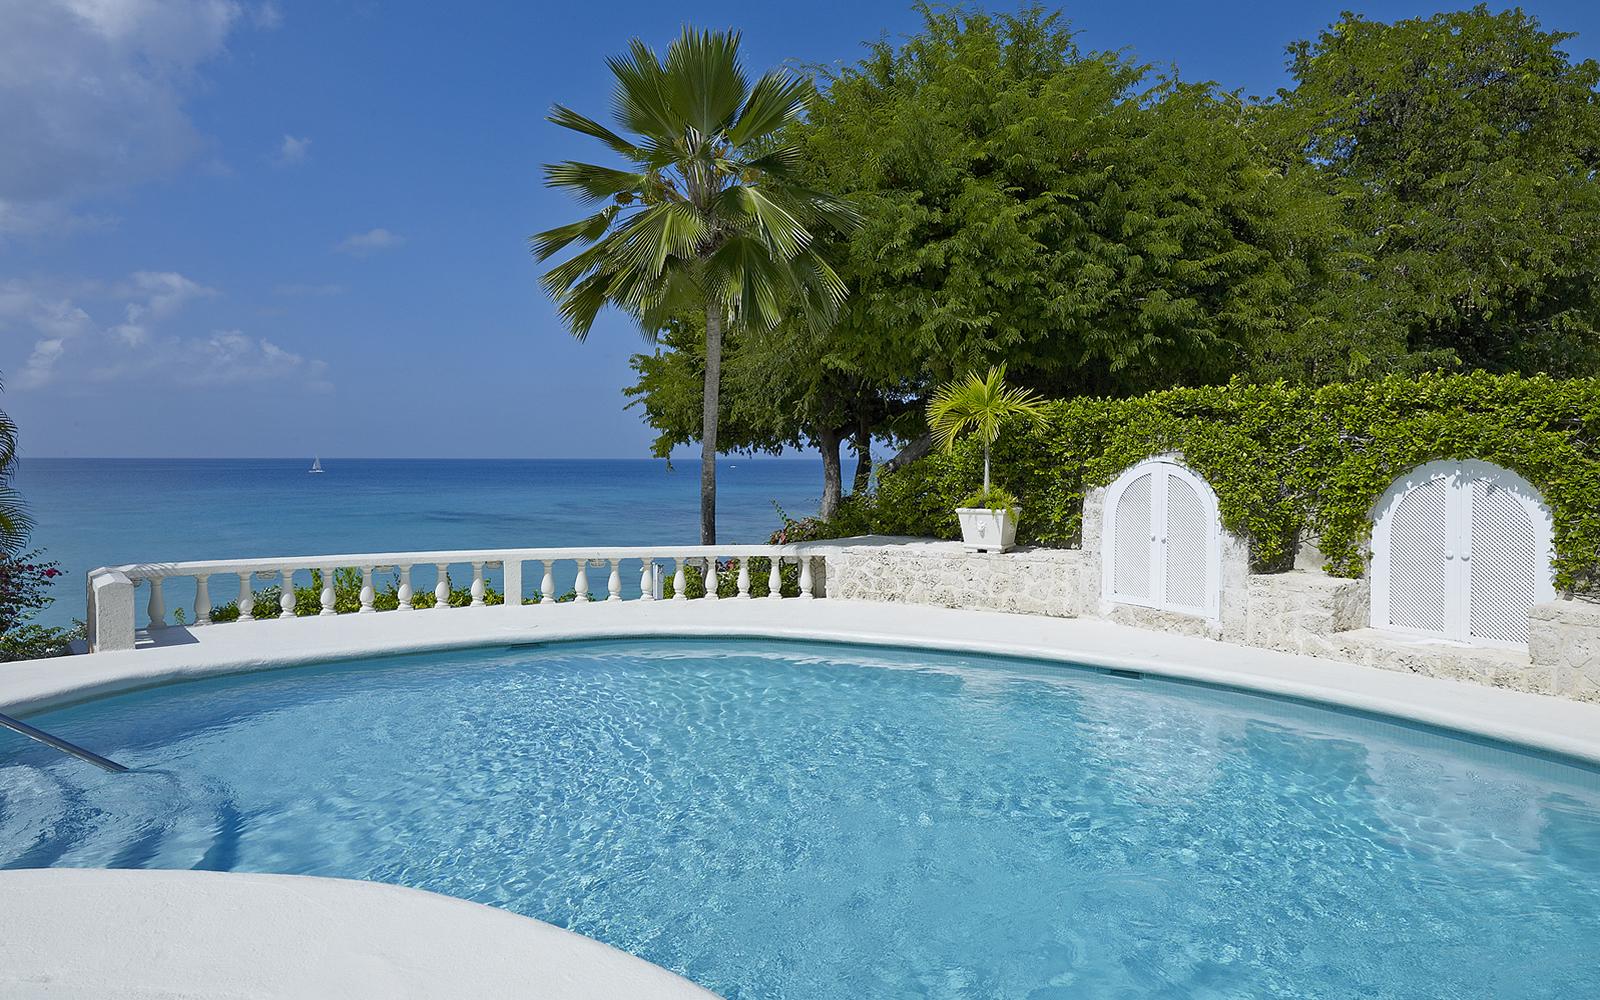 Beachfront Villas in Barbados   Fleewinter Tailor-Made Holidays